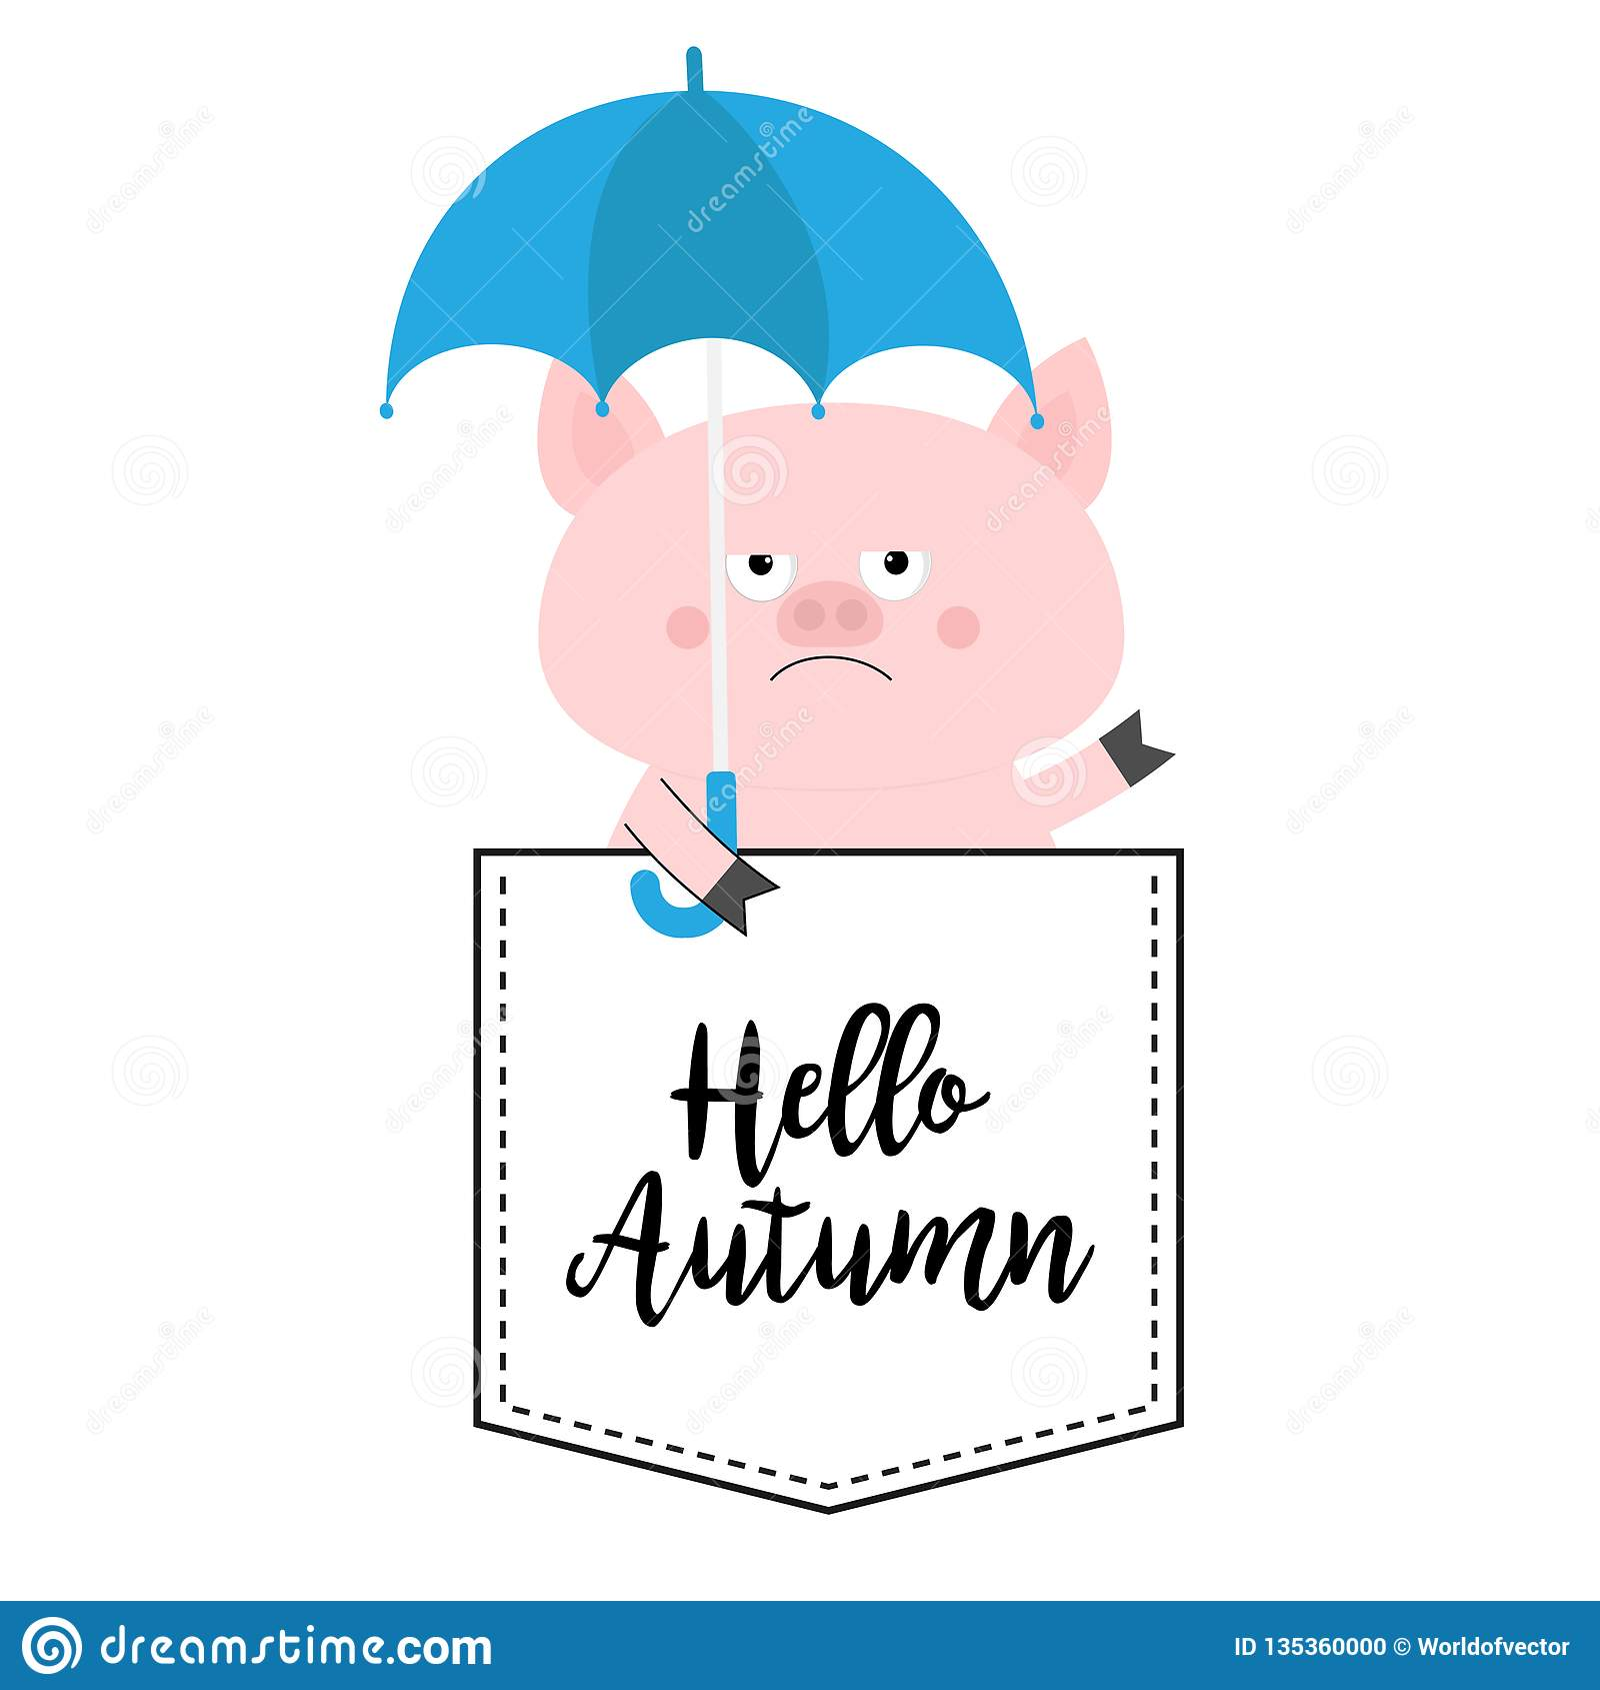 Hello autumn. Pig face head in the pocket. Umbrella. Cute cartoon animals. Piggy piglet character. Dash line. White and black